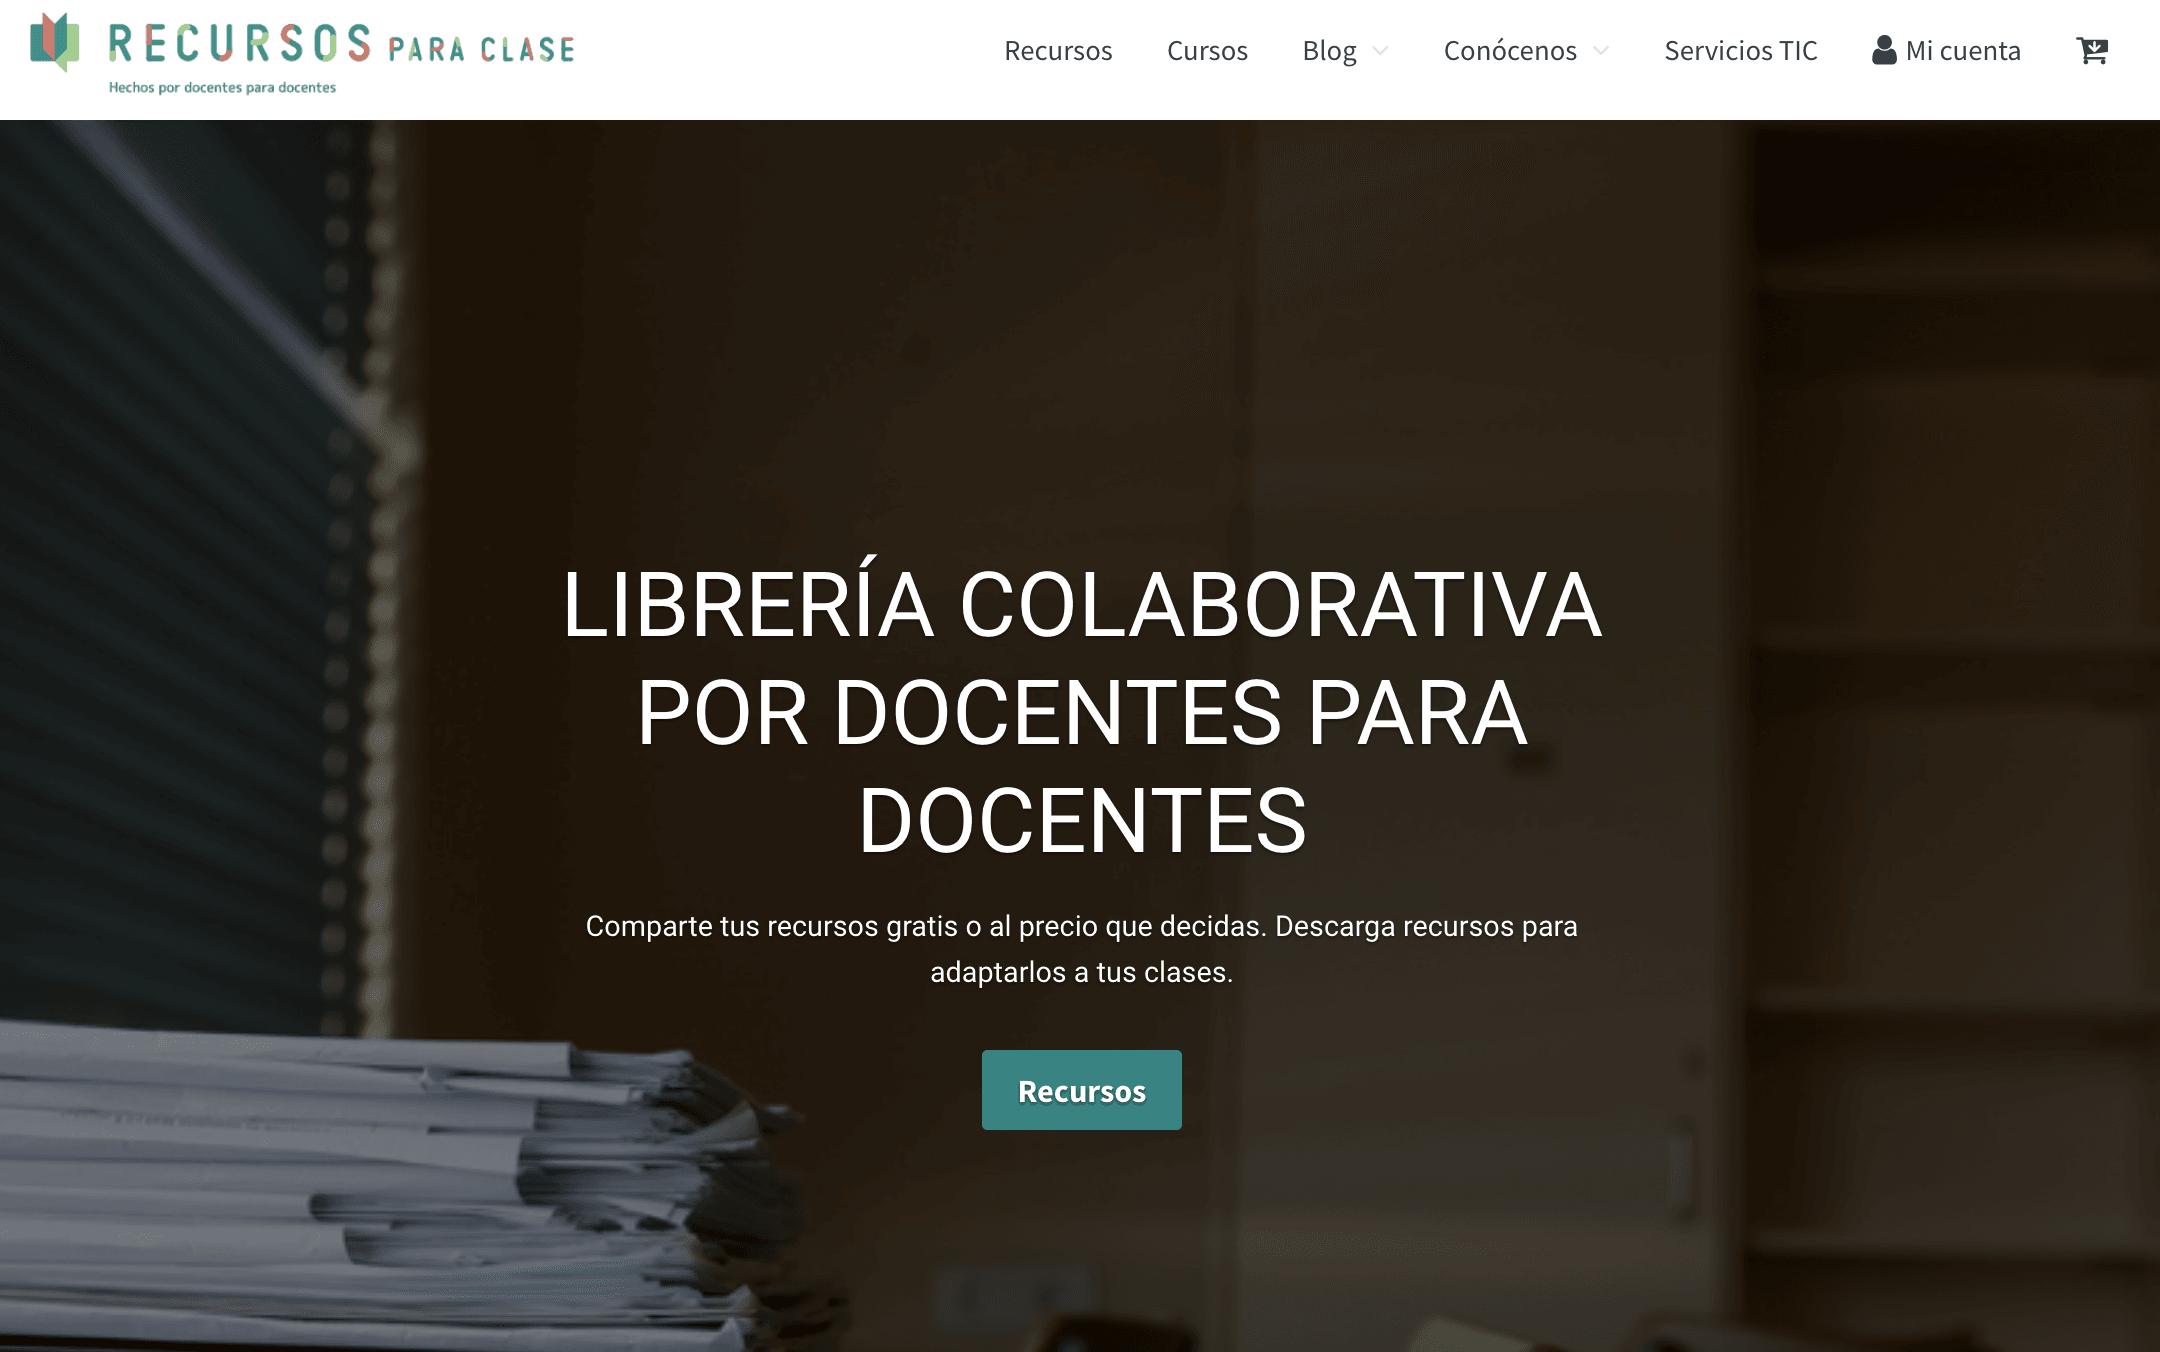 Nace Recursos para Clase, una plataforma hecha por docentes para docentes